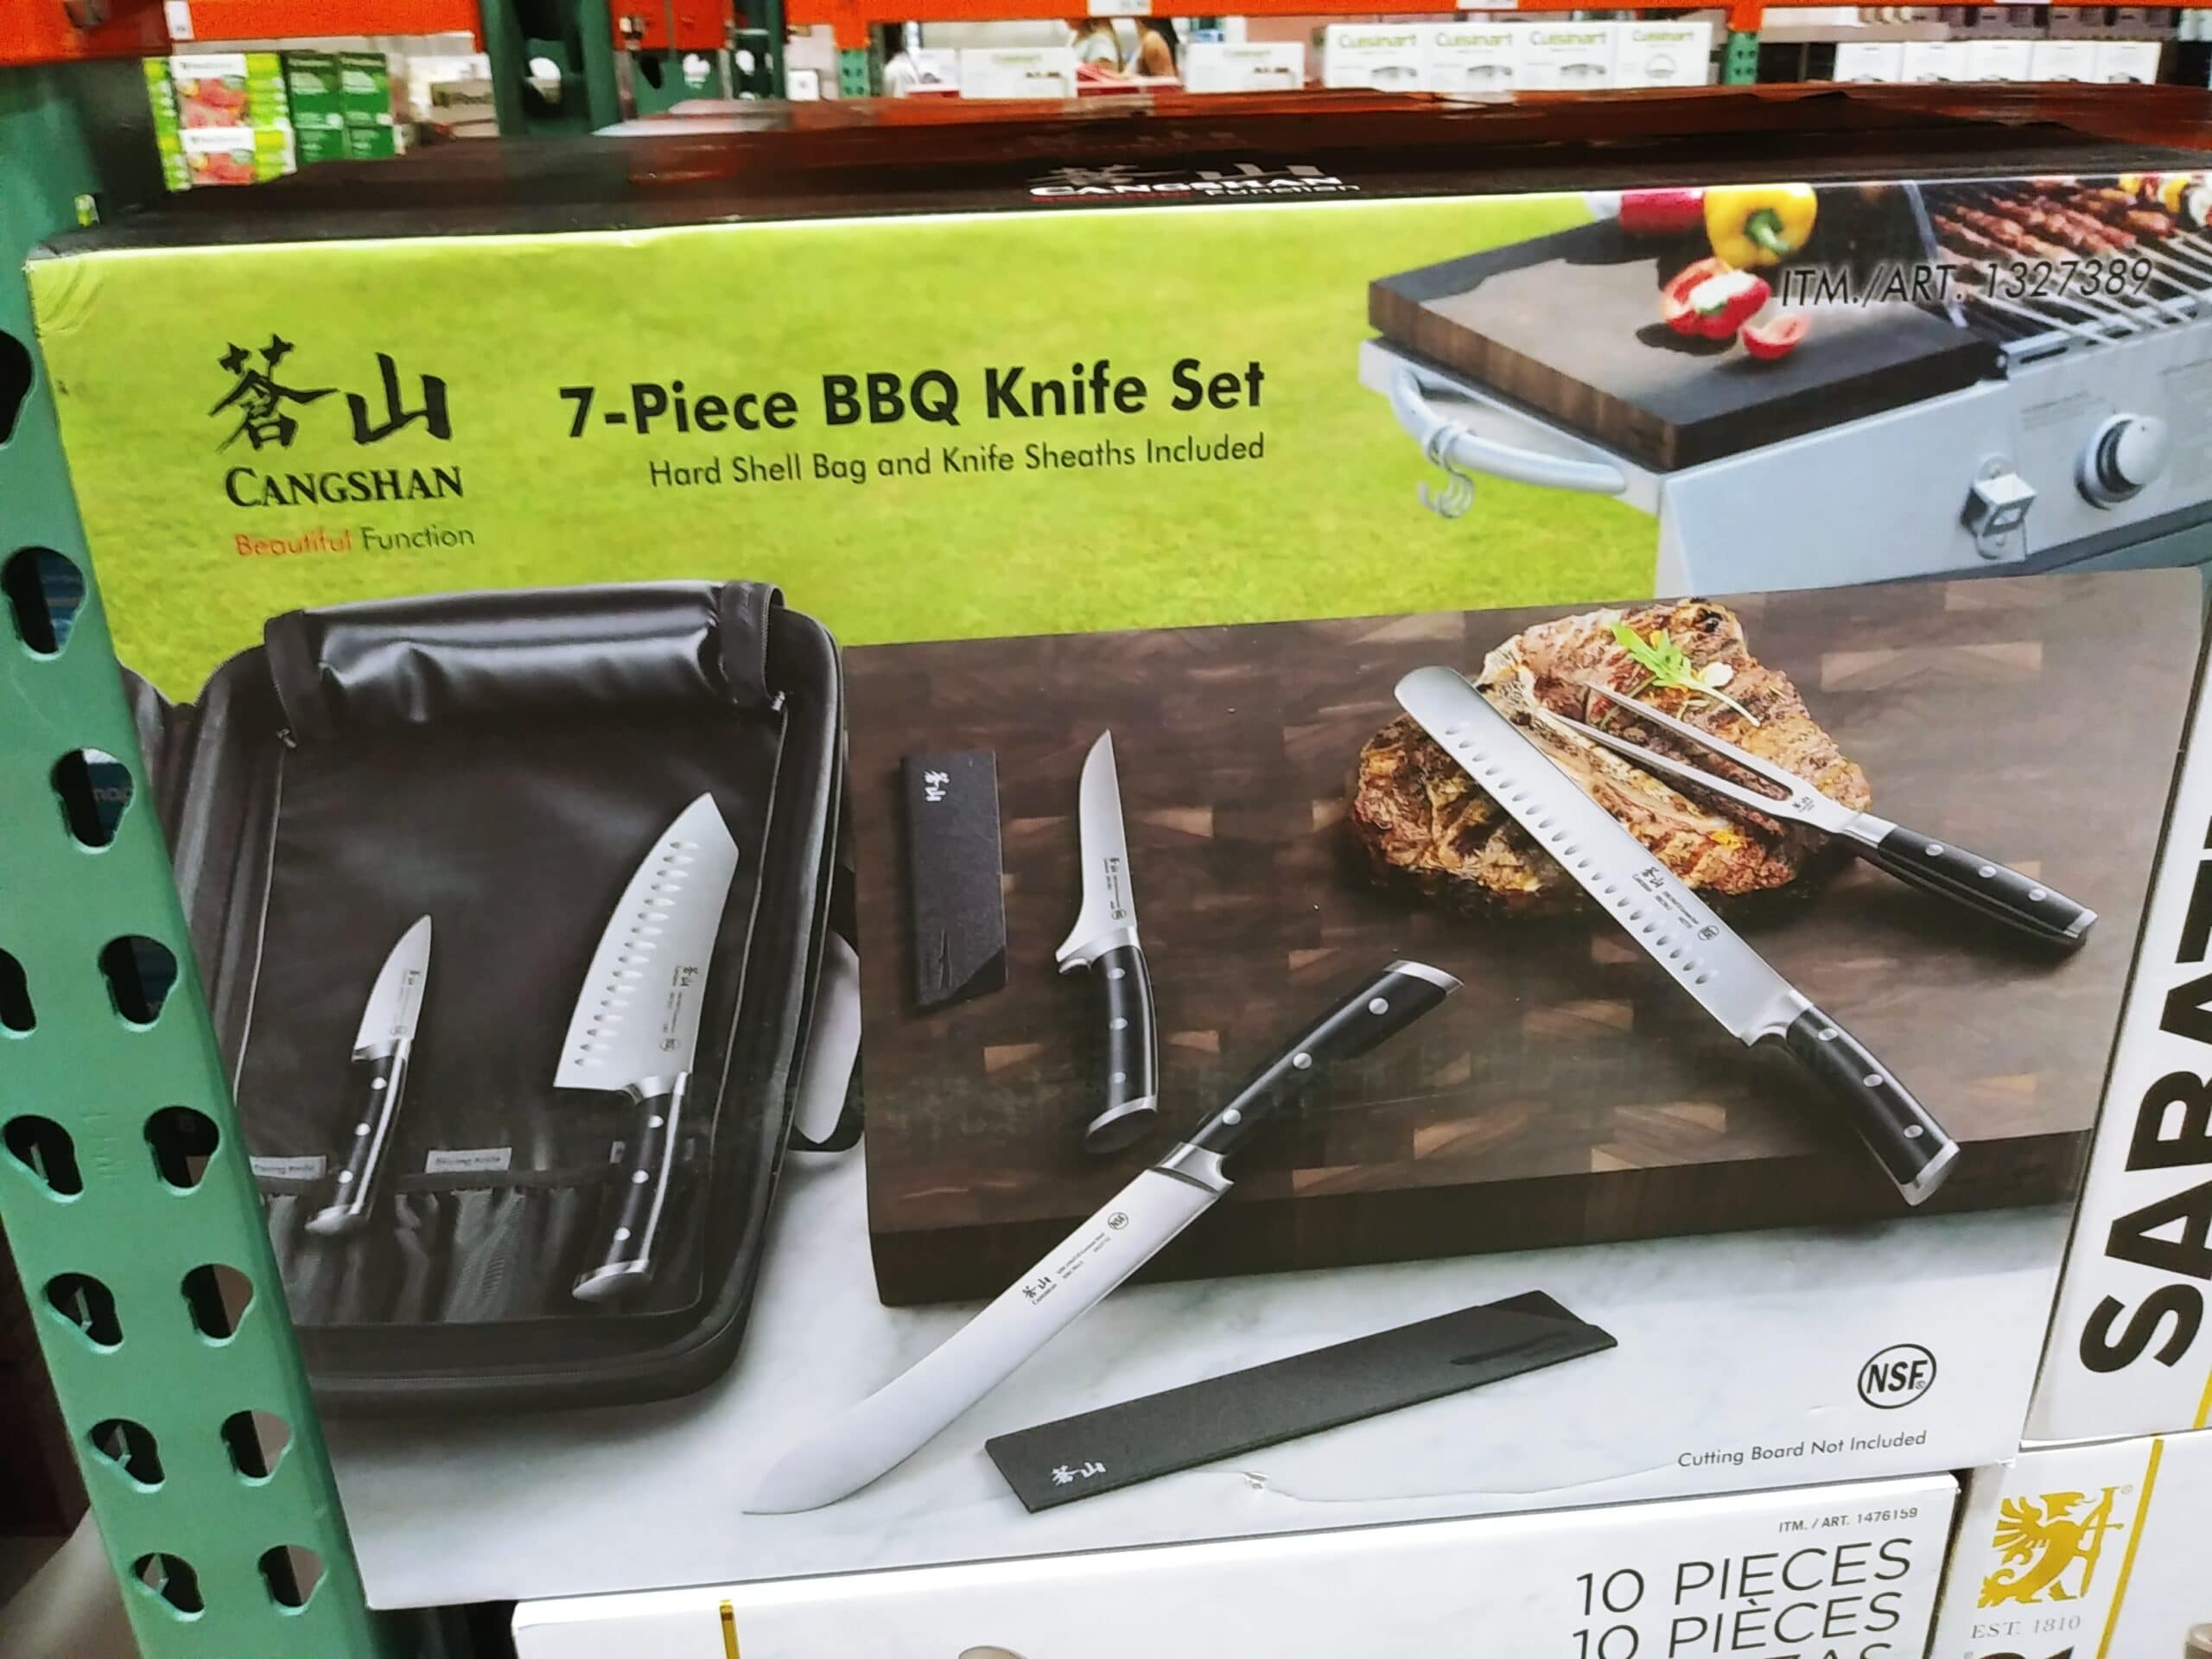 Cangshan BBQ Knife Set 7pc $79.99